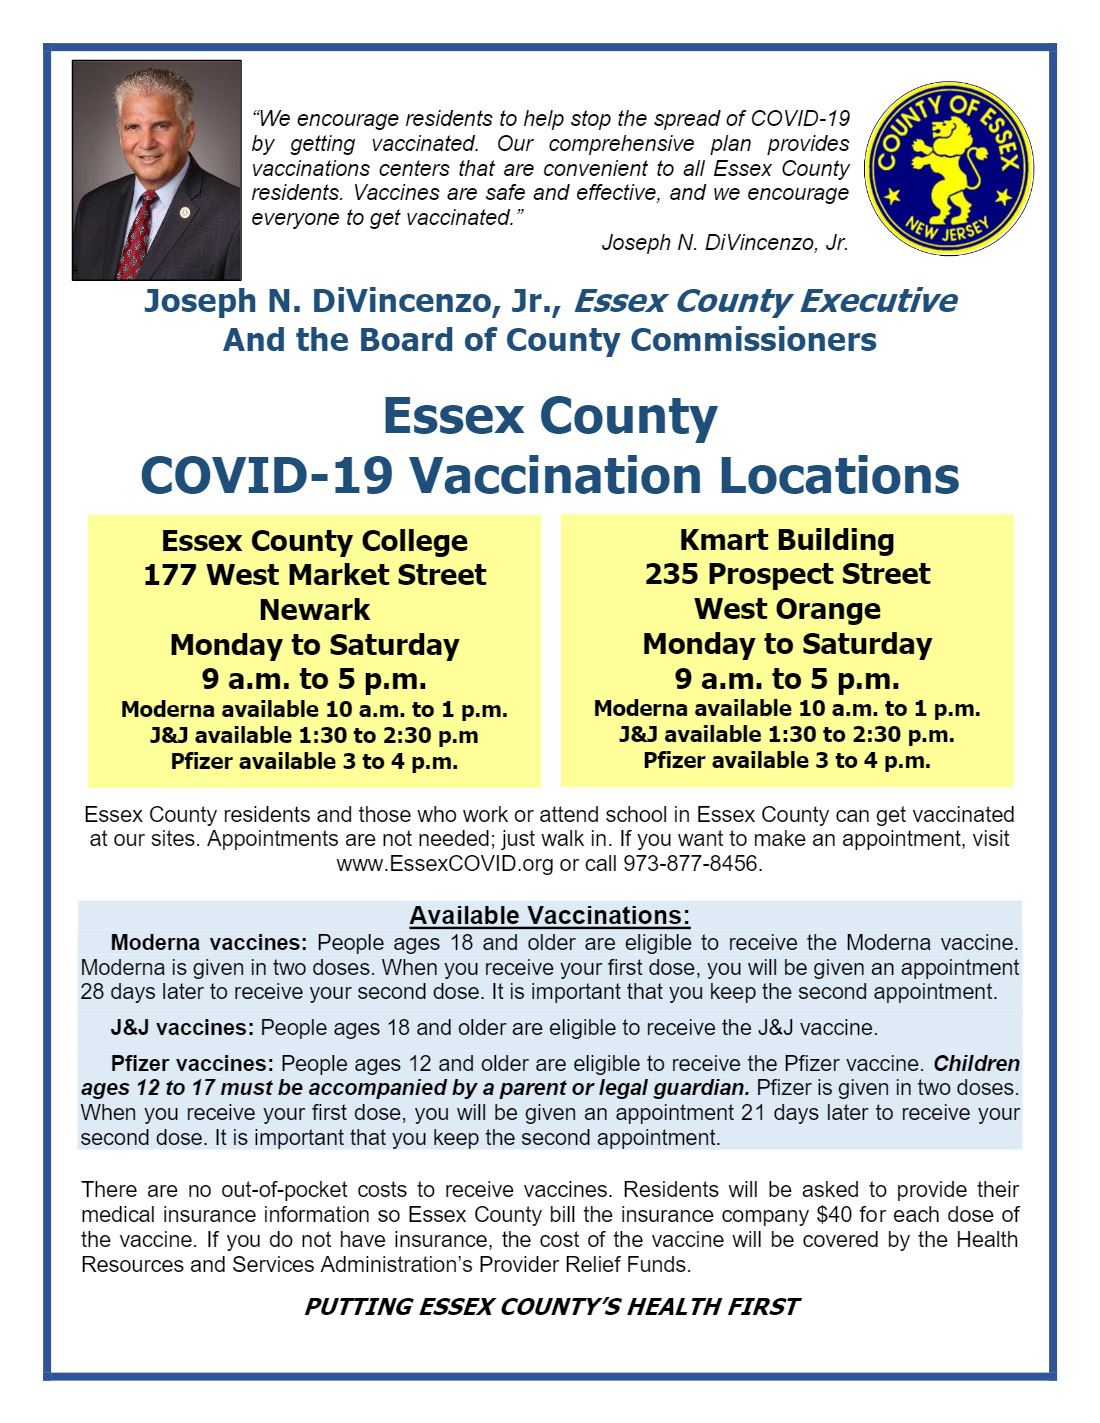 Essex County Covid Vaccination Locations